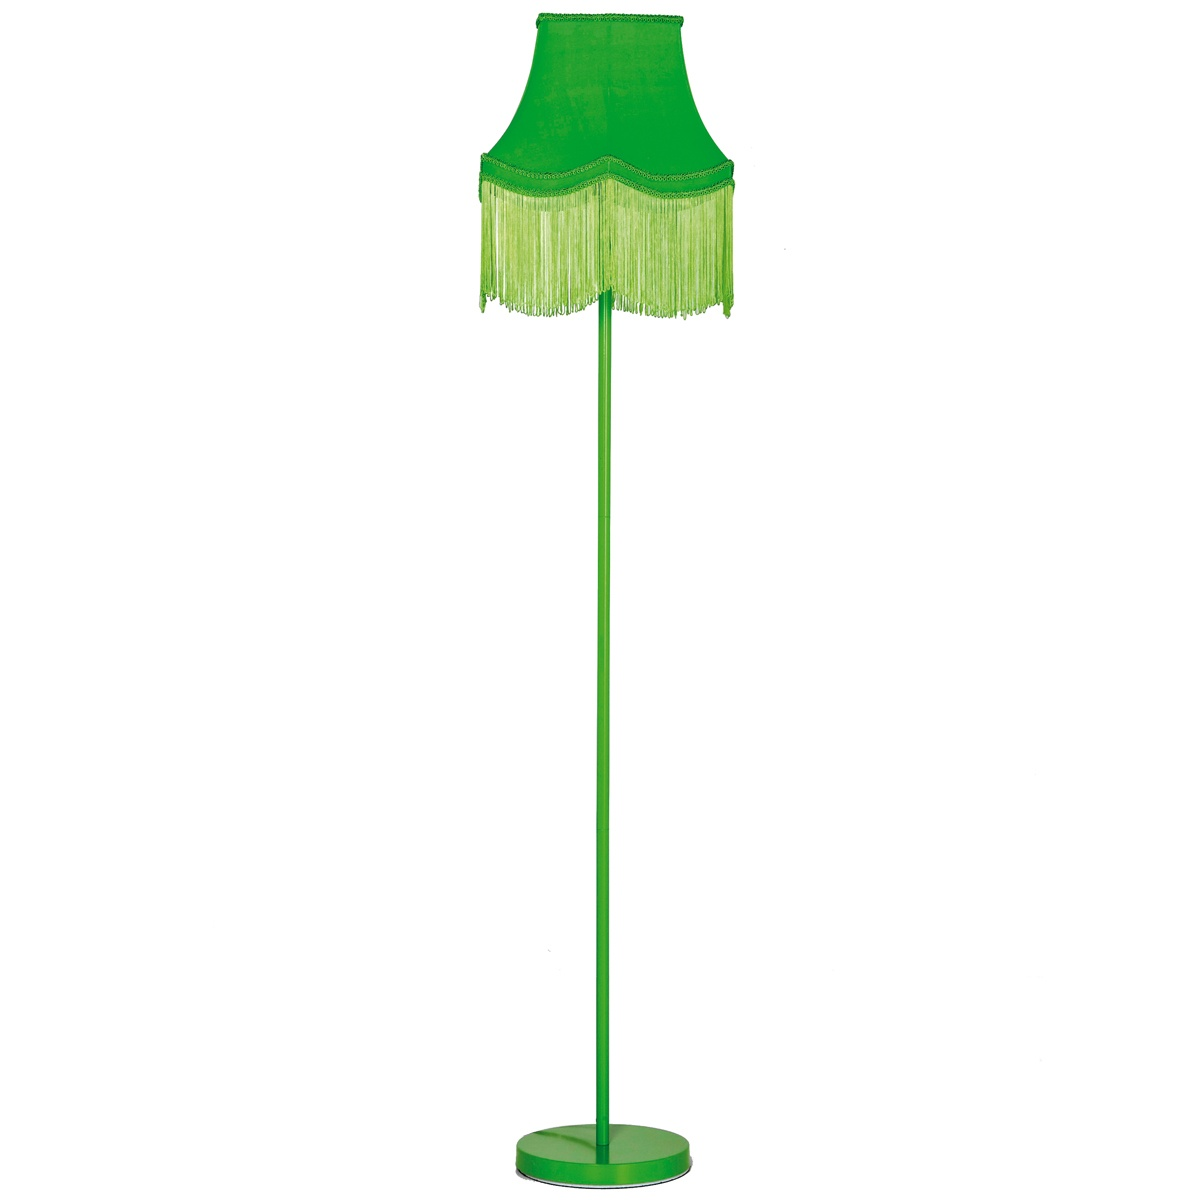 Fluoro Fringe Lime Green Floor Lamp French Bedroom Company